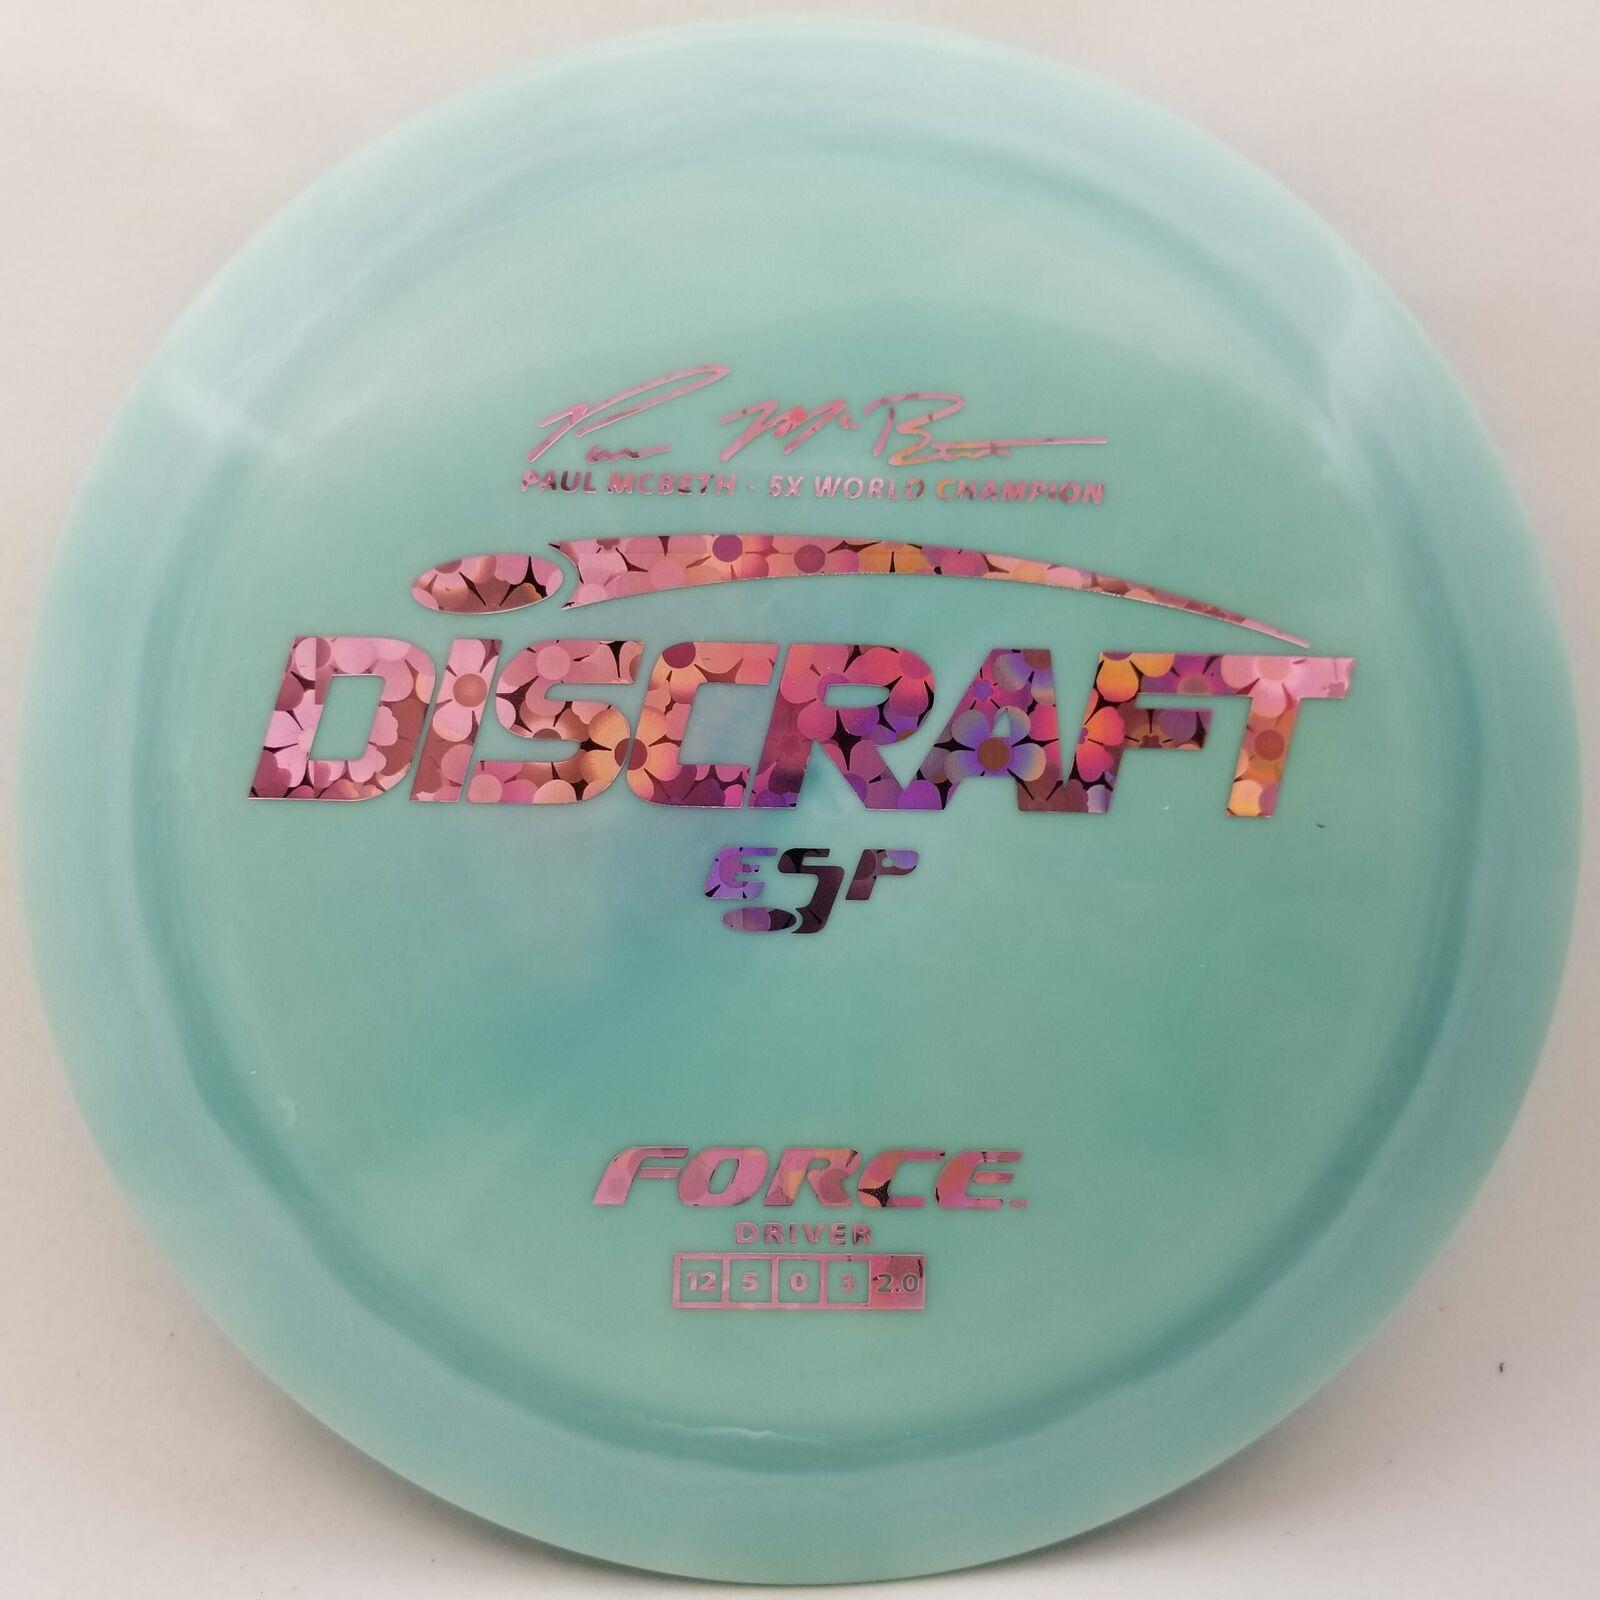 New Discraft ESP Force (Paul McBeth 5x Signature Series) 170-172g